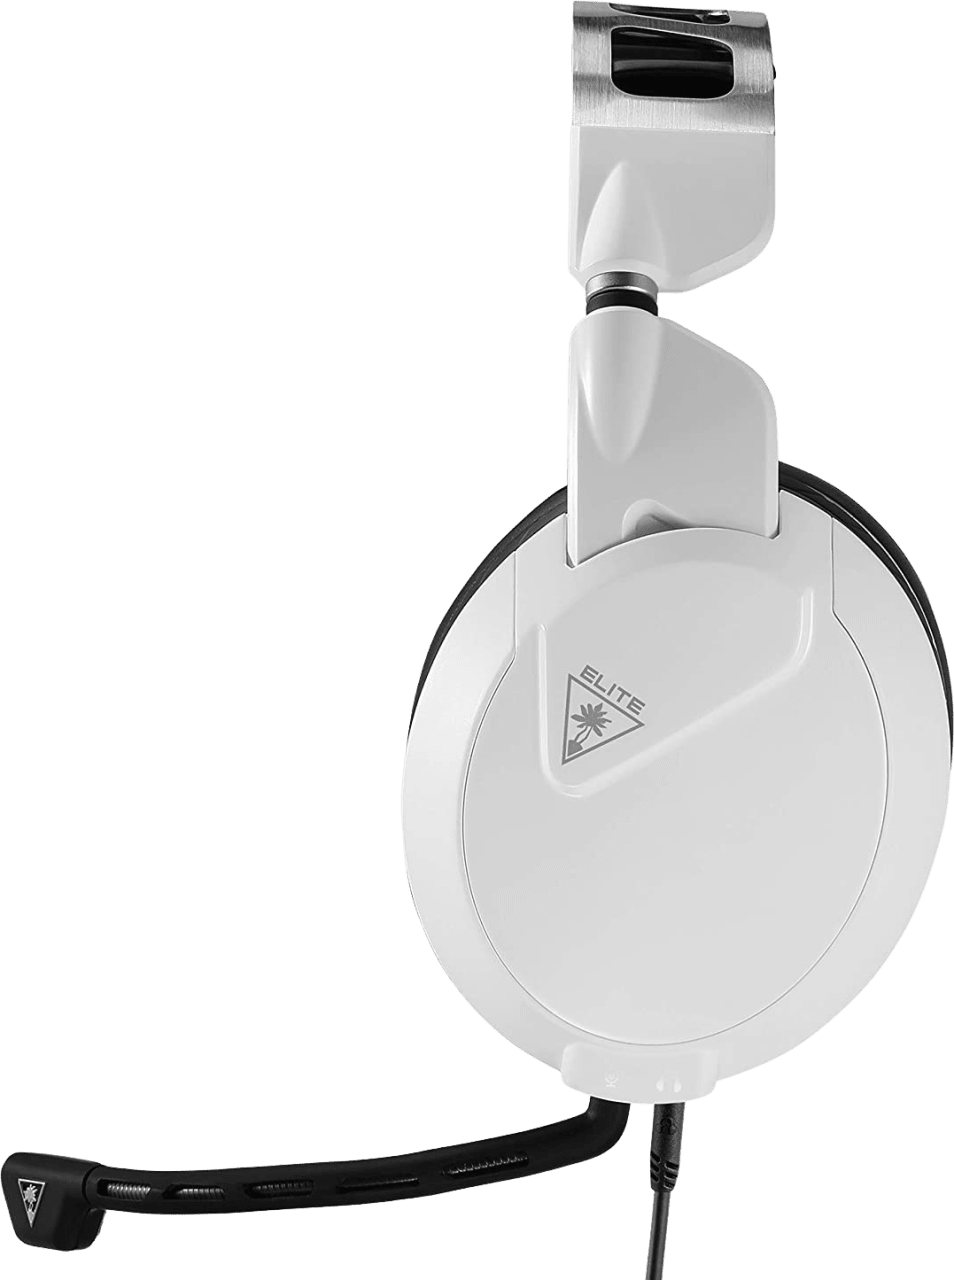 White / Black Turtle Beach Elite Pro 2 + SuperAmp (Xbox) Over-ear Gaming Headphones.4